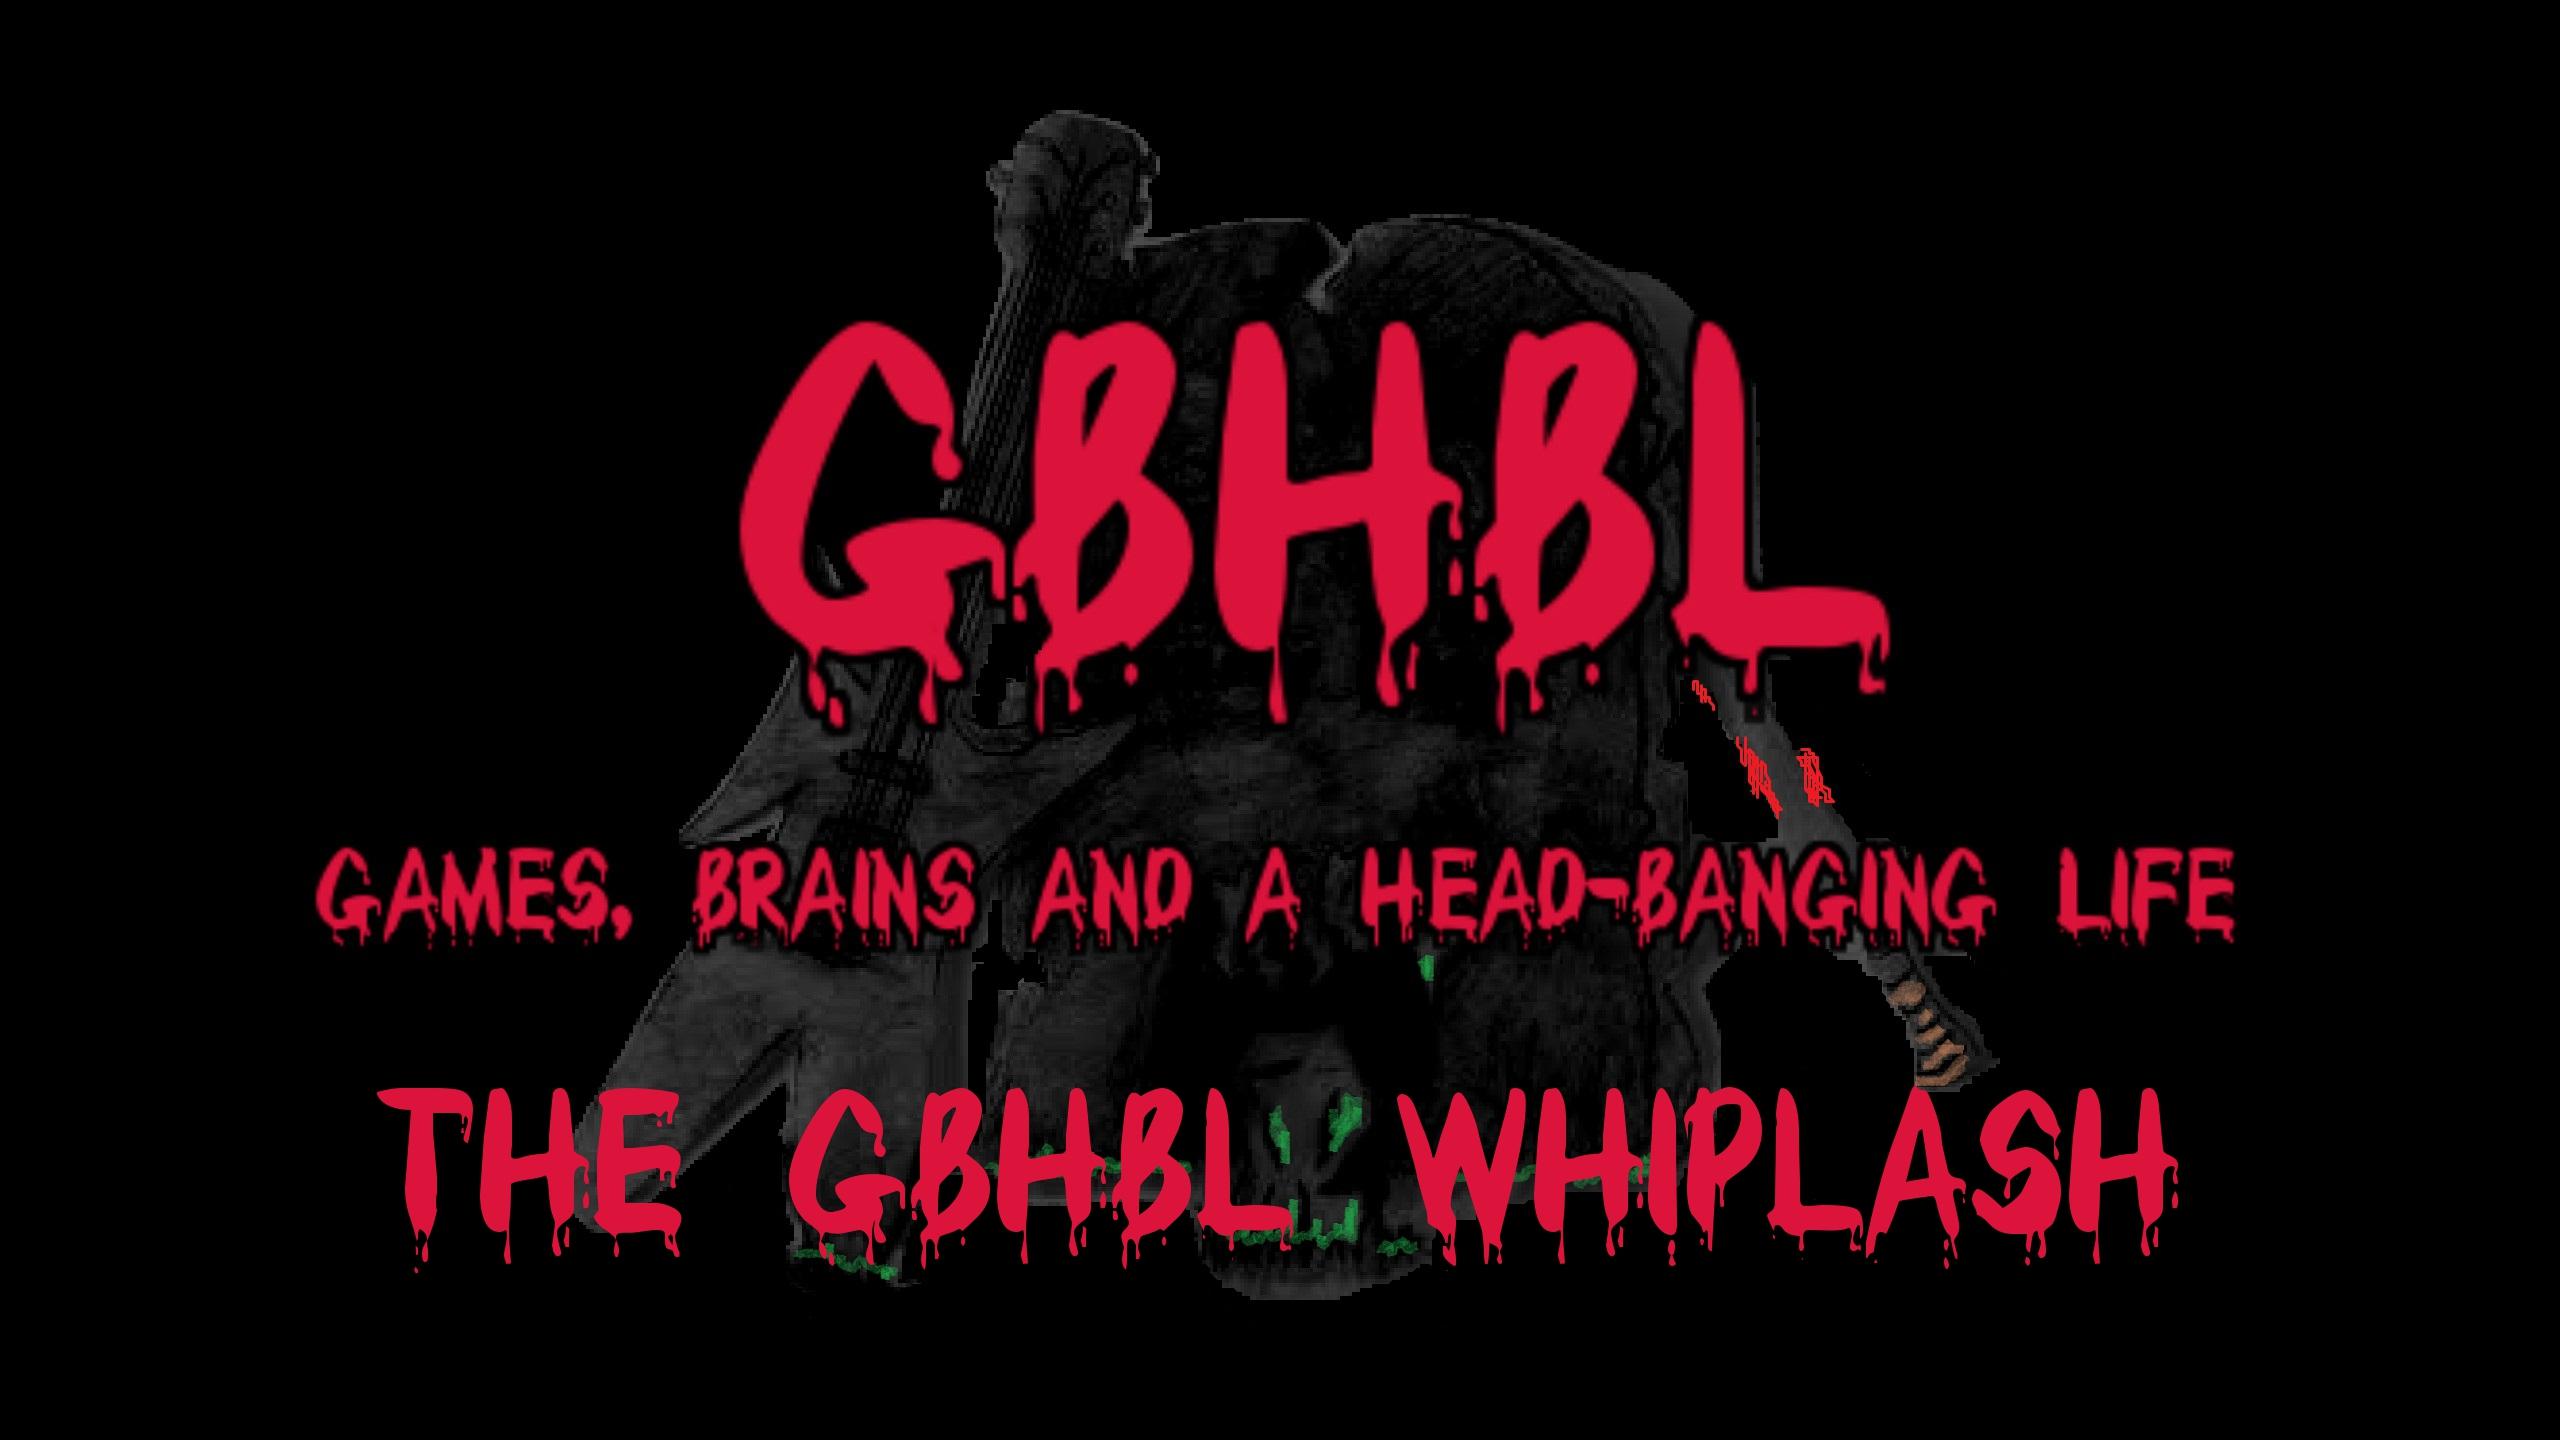 The GBHBL Whiplash